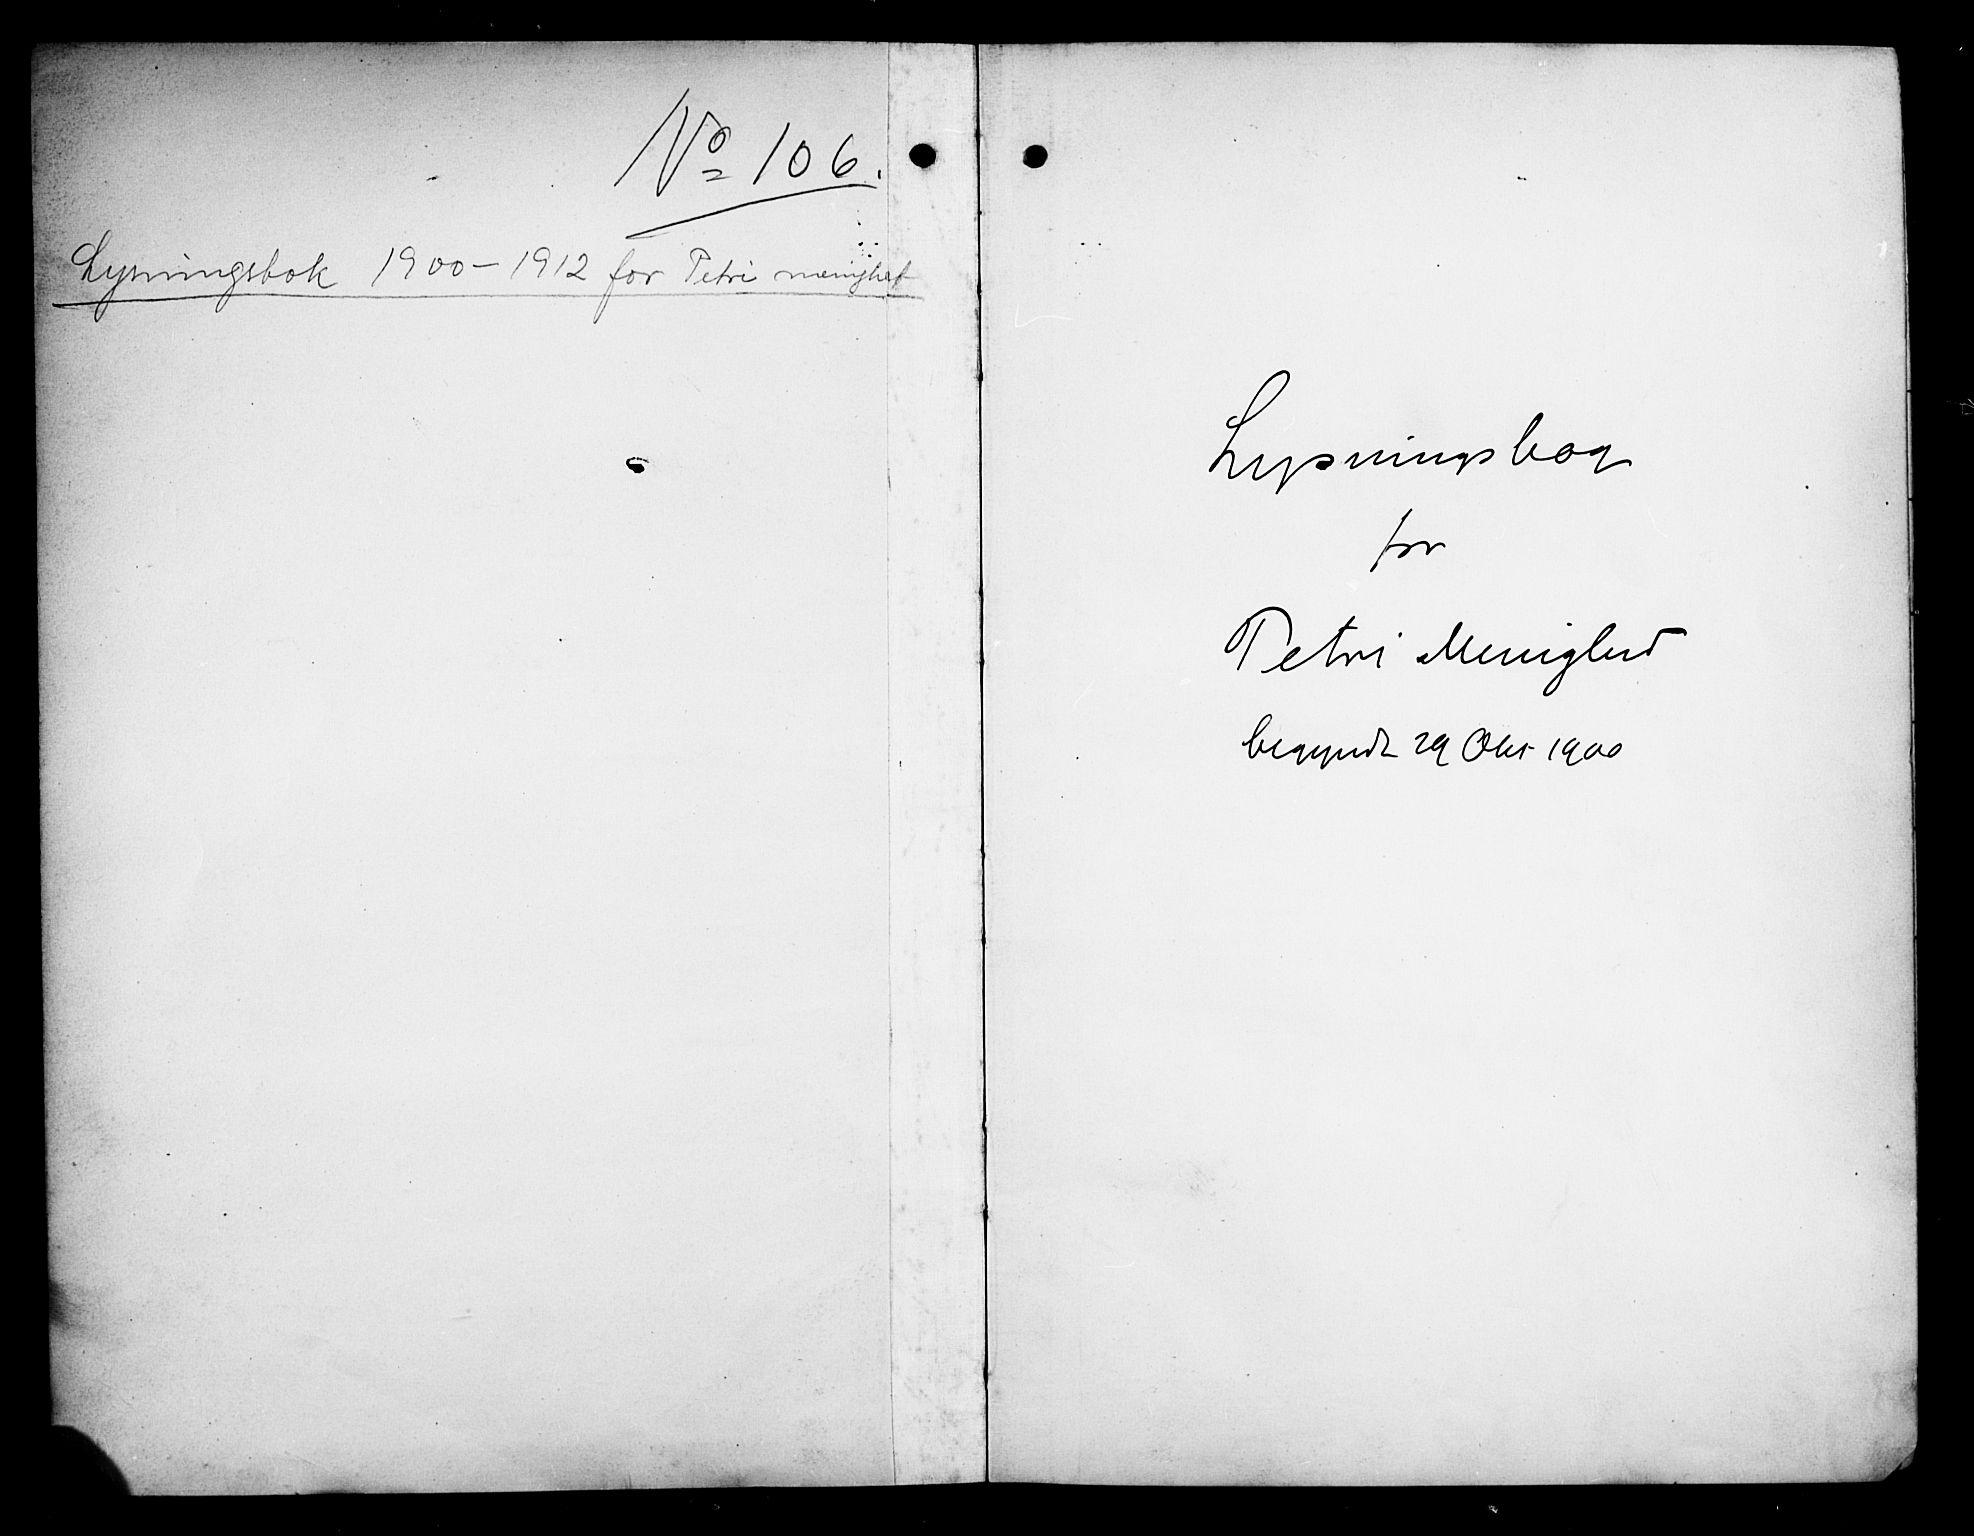 SAO, Petrus prestekontor Kirkebøker, H/Ha/L0003: Lysningsprotokoll nr. 3, 1900-1912